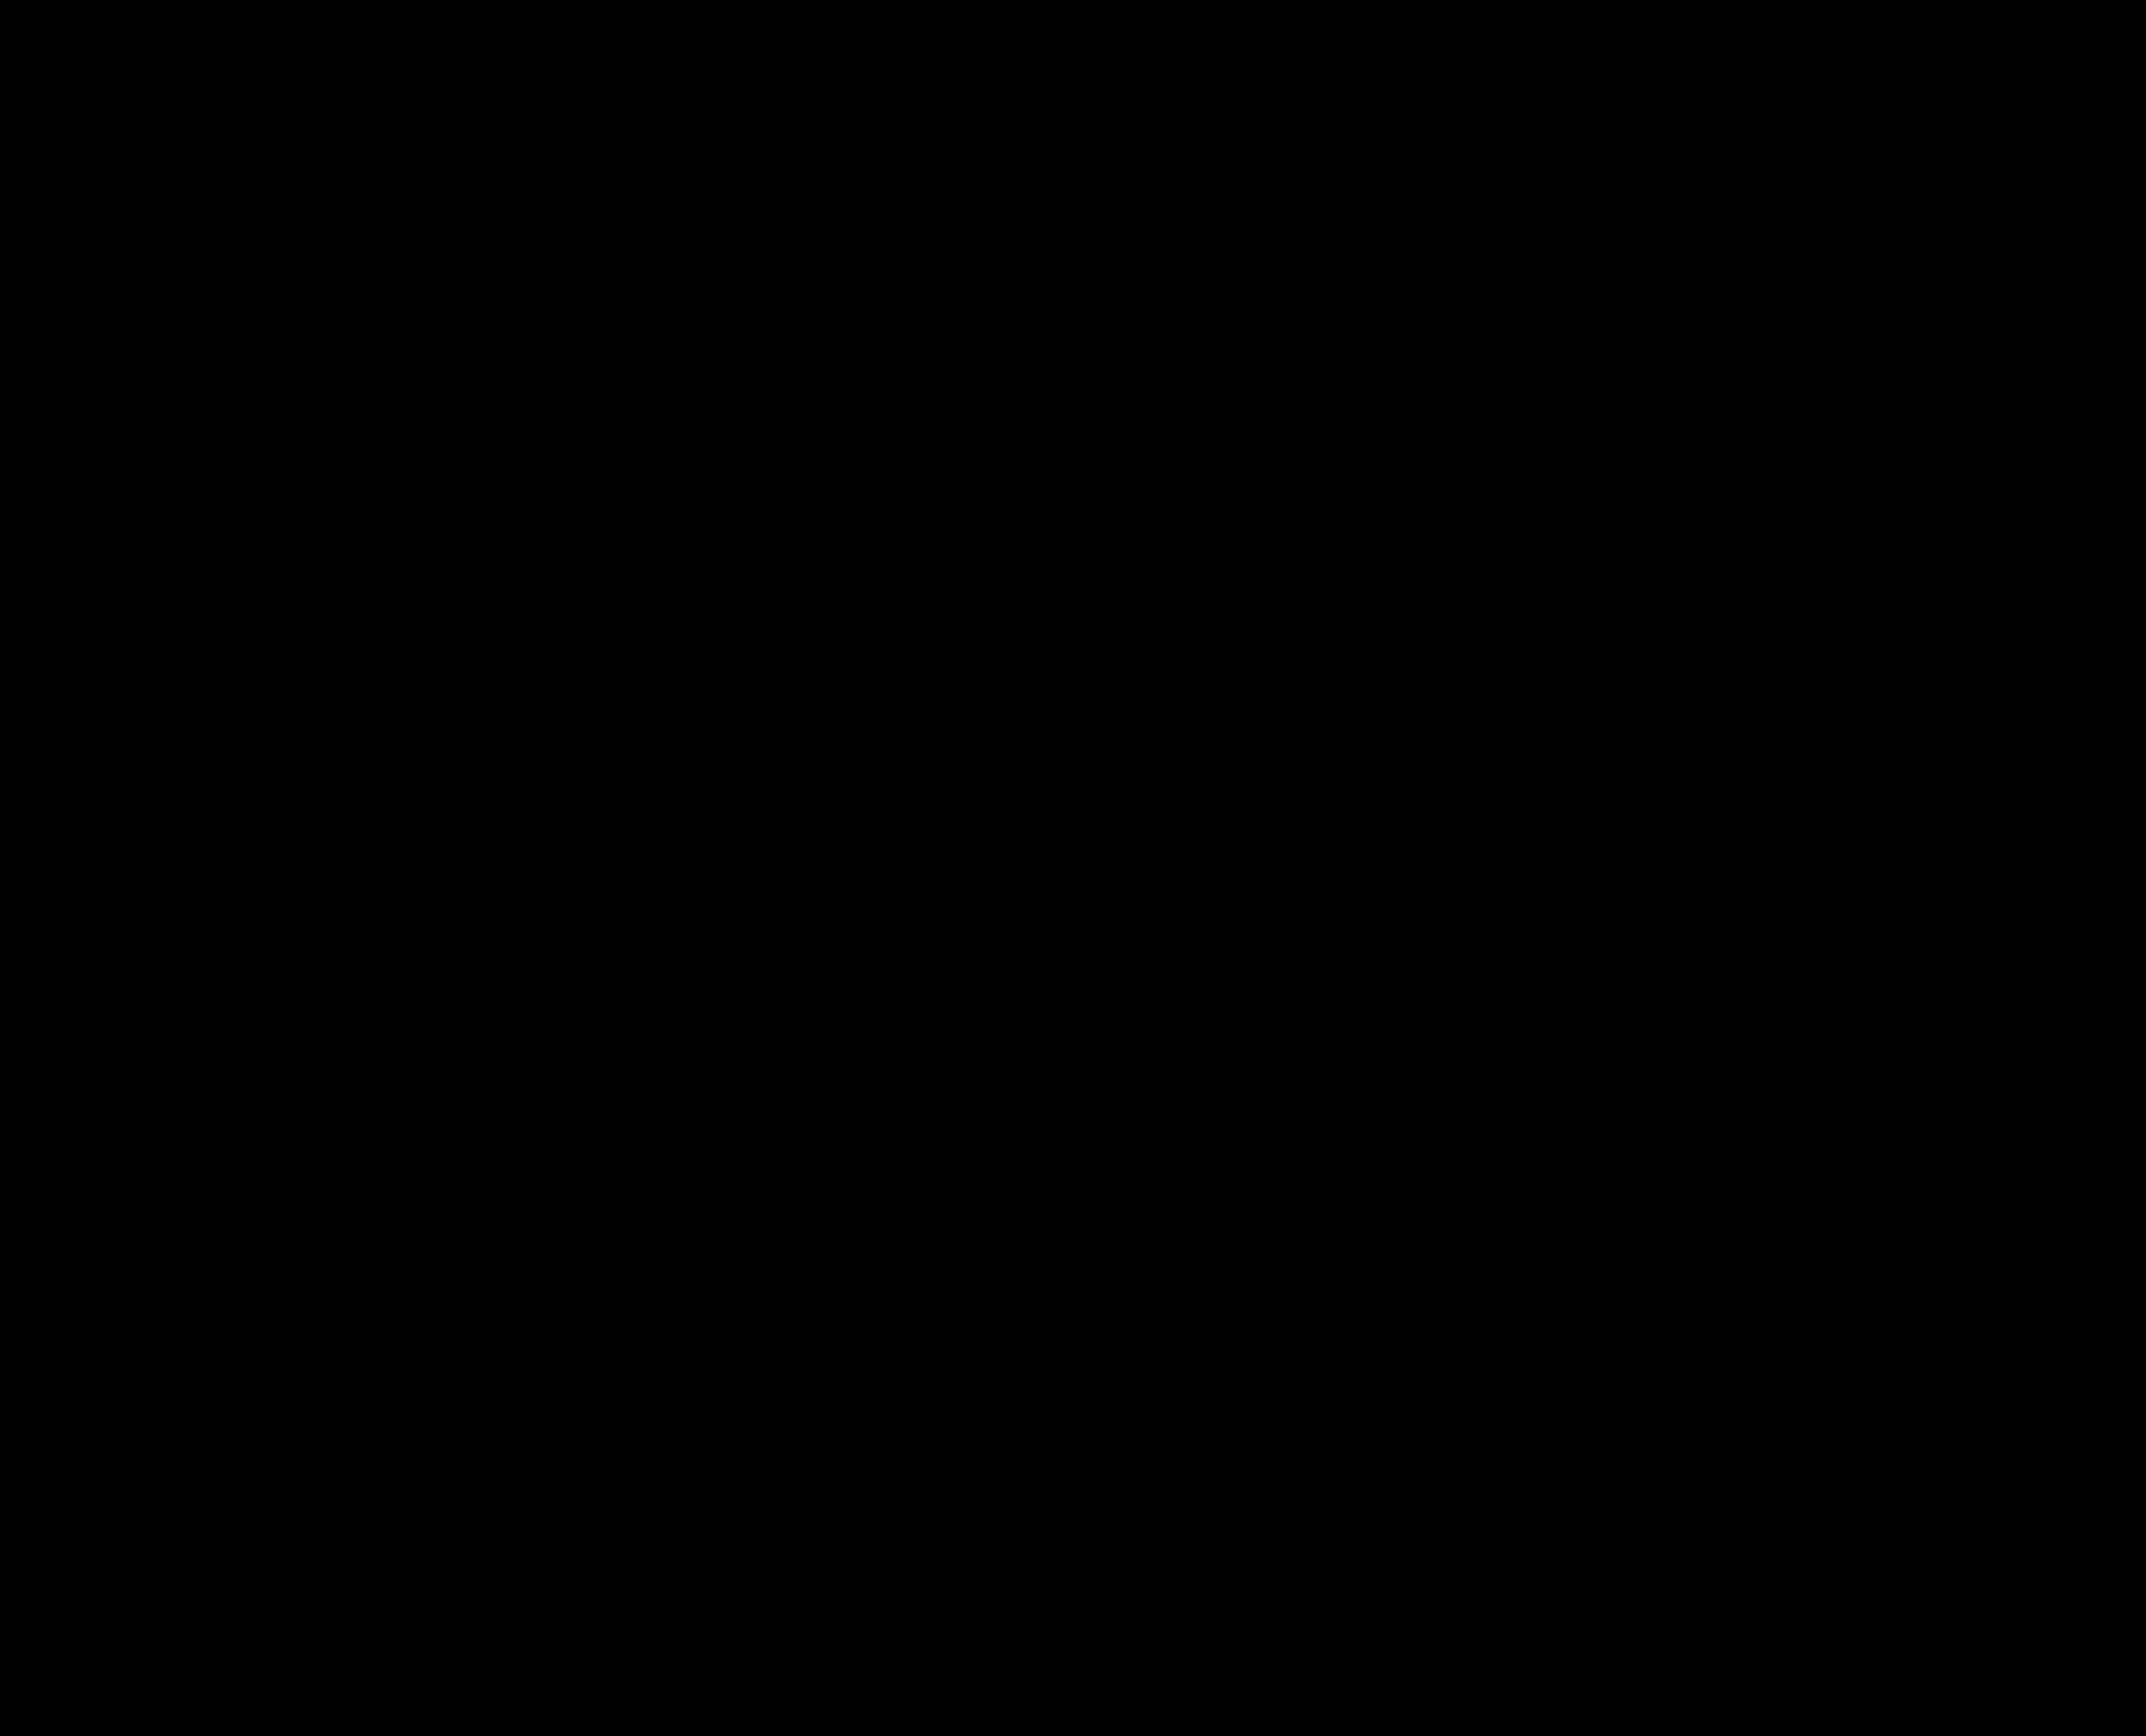 Legal Scales Black Silhouette - Free Cli-Legal Scales Black Silhouette - Free Clip Art-10